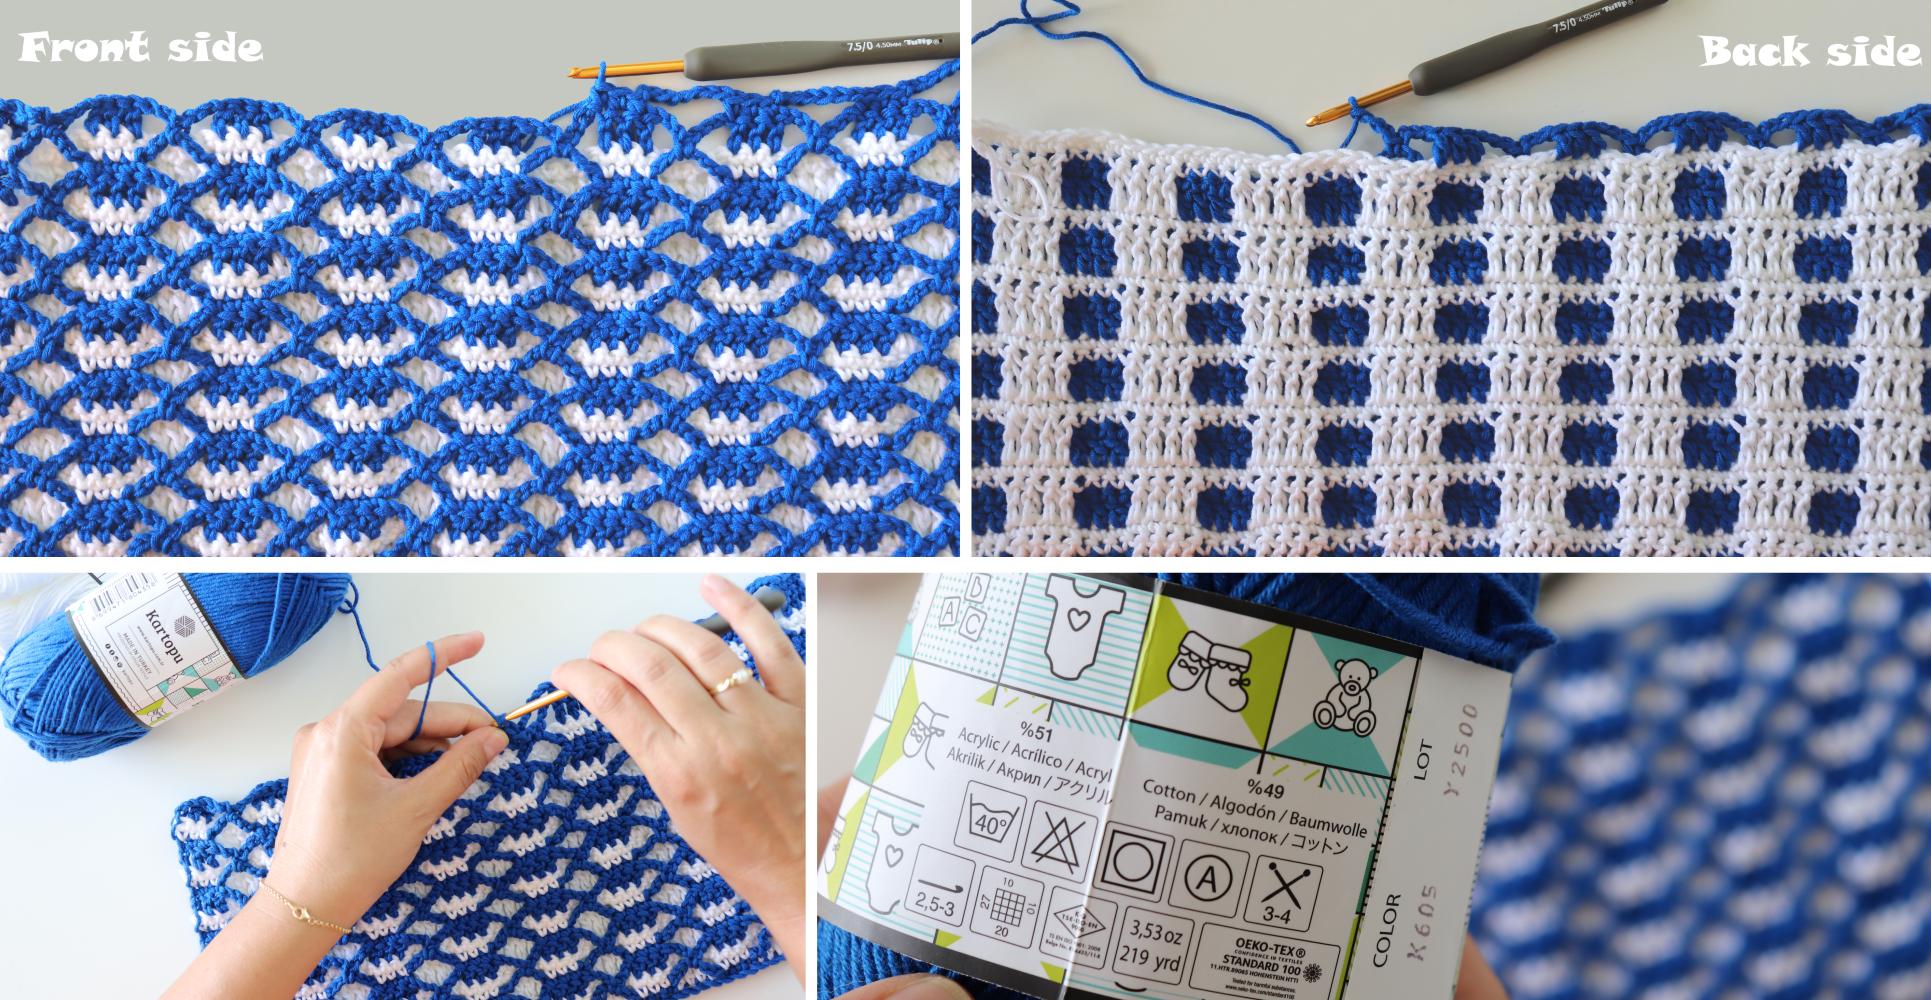 Crochet Double-sided Interlocking Stitch Written Pattern